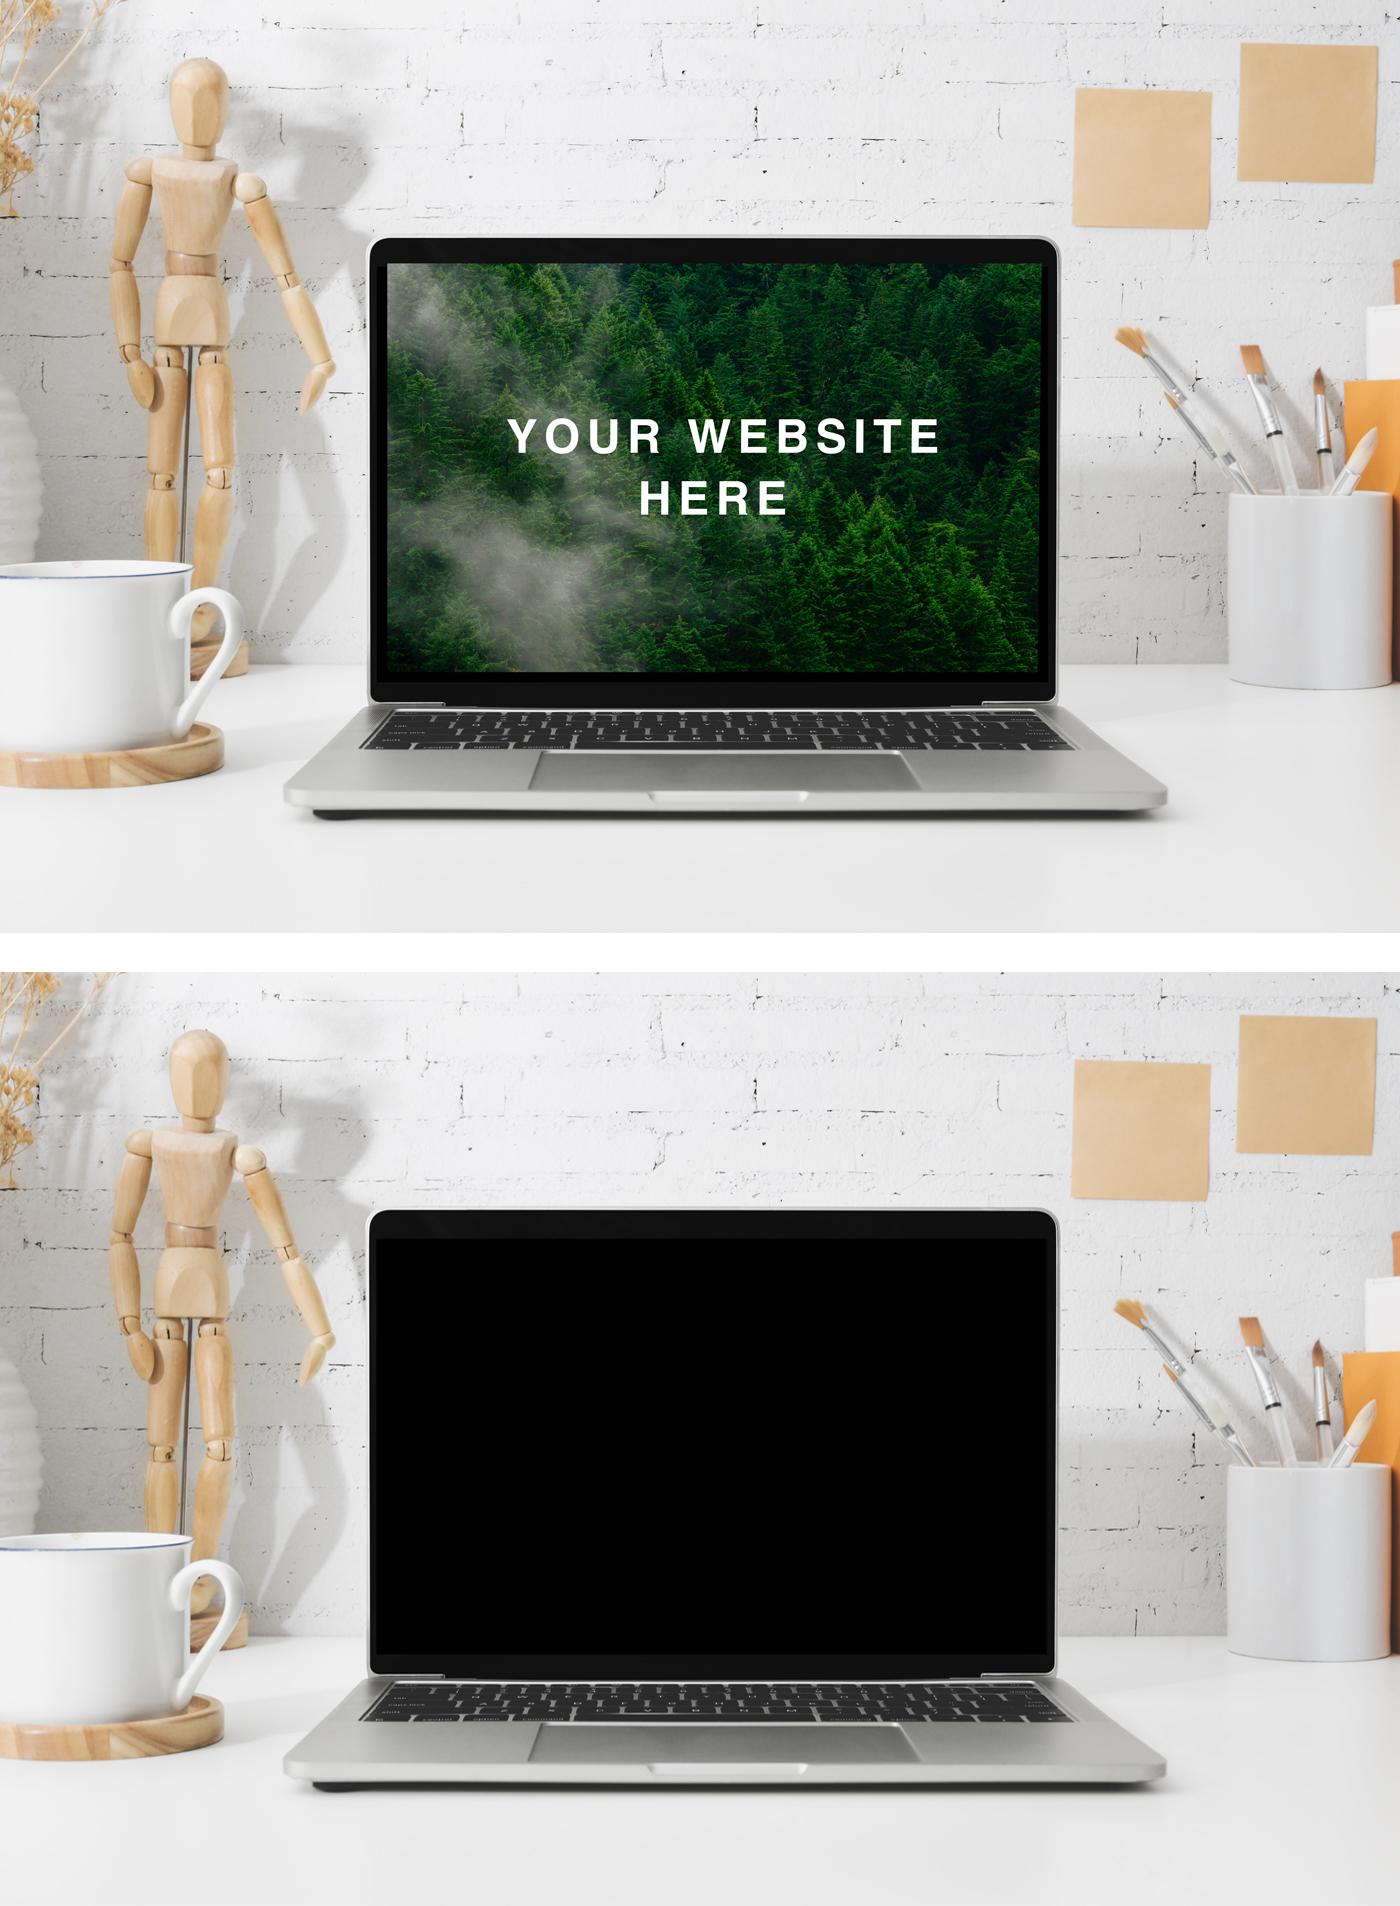 Retina MacBook Workspace Mockup